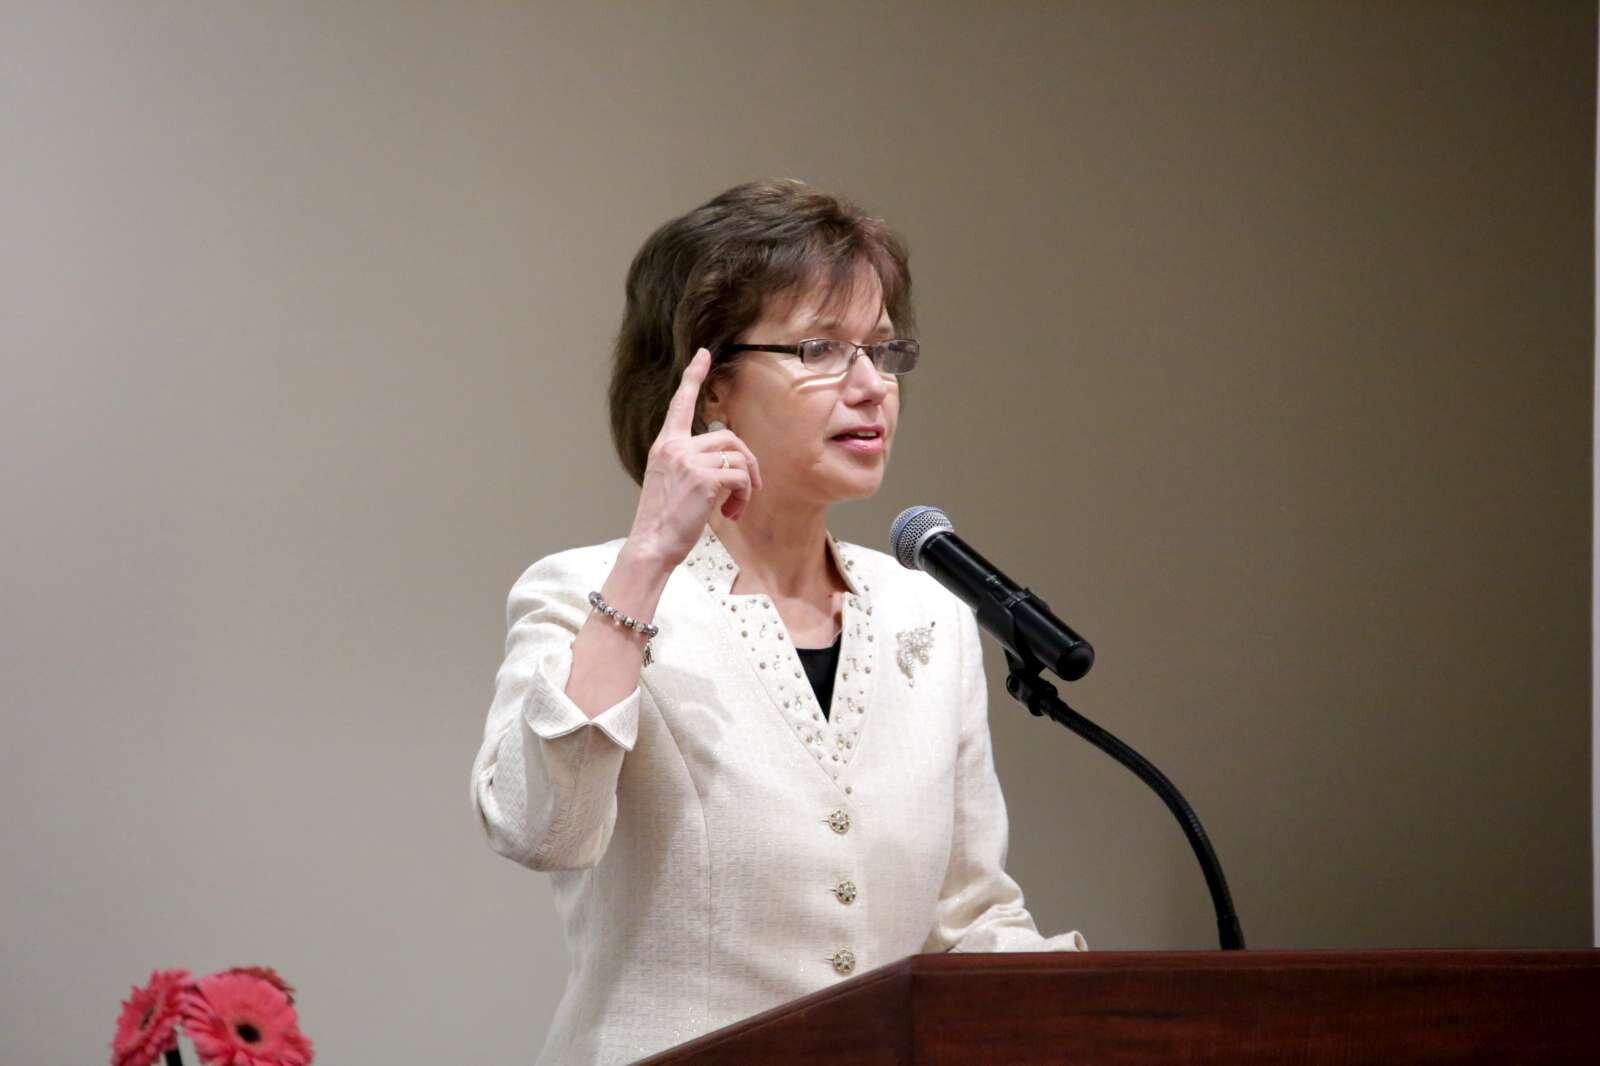 WFWP USA President Angelika Selle